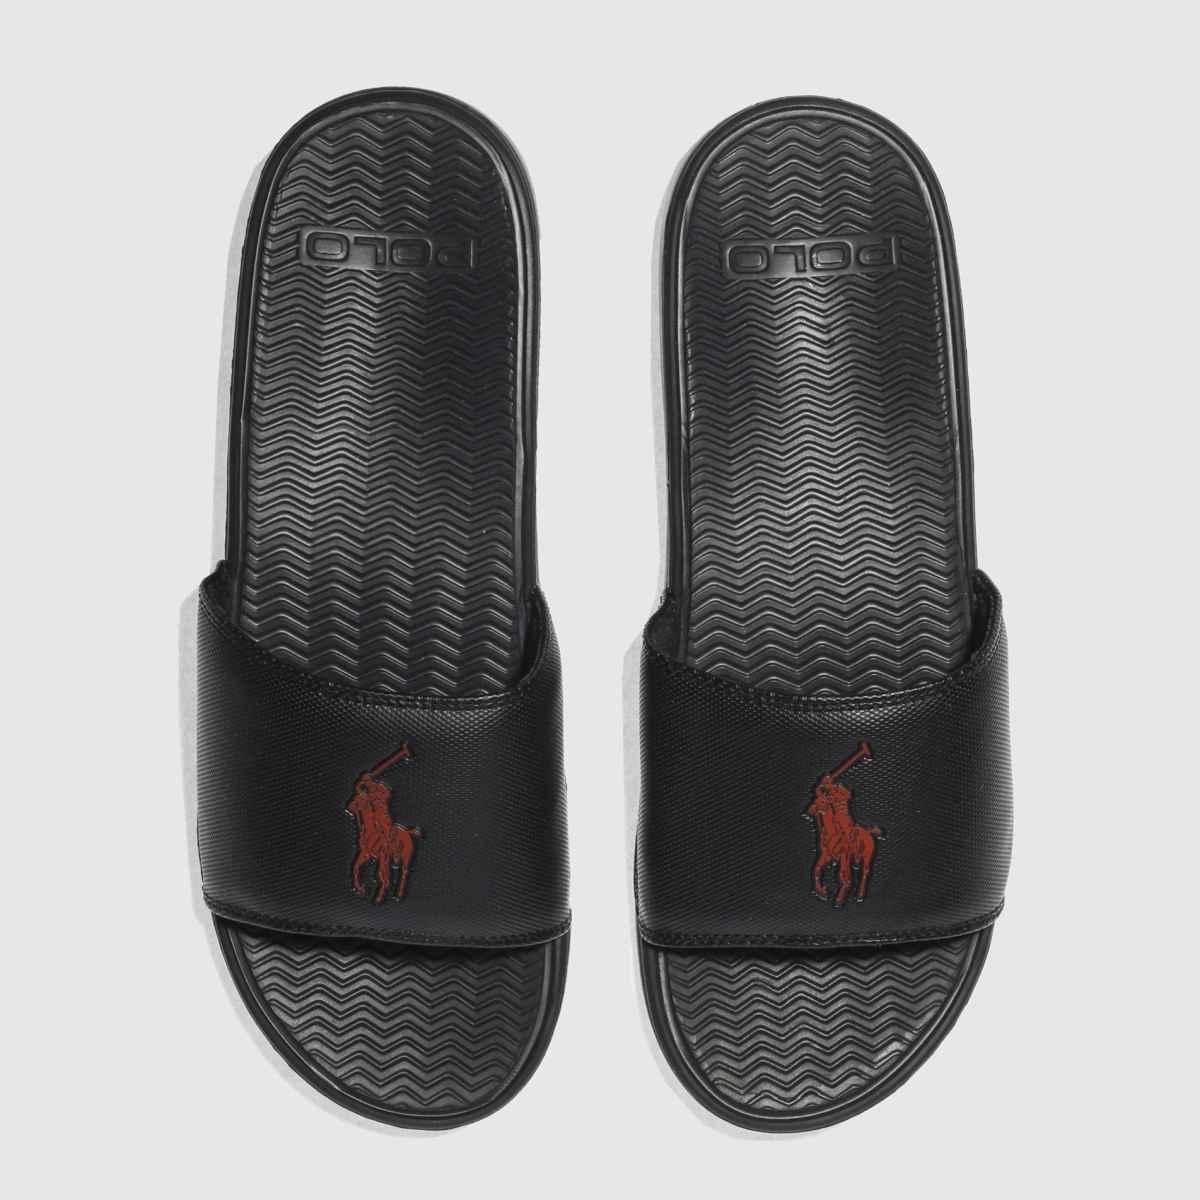 Polo Ralph Lauren Black & Red Rodwell Sandals